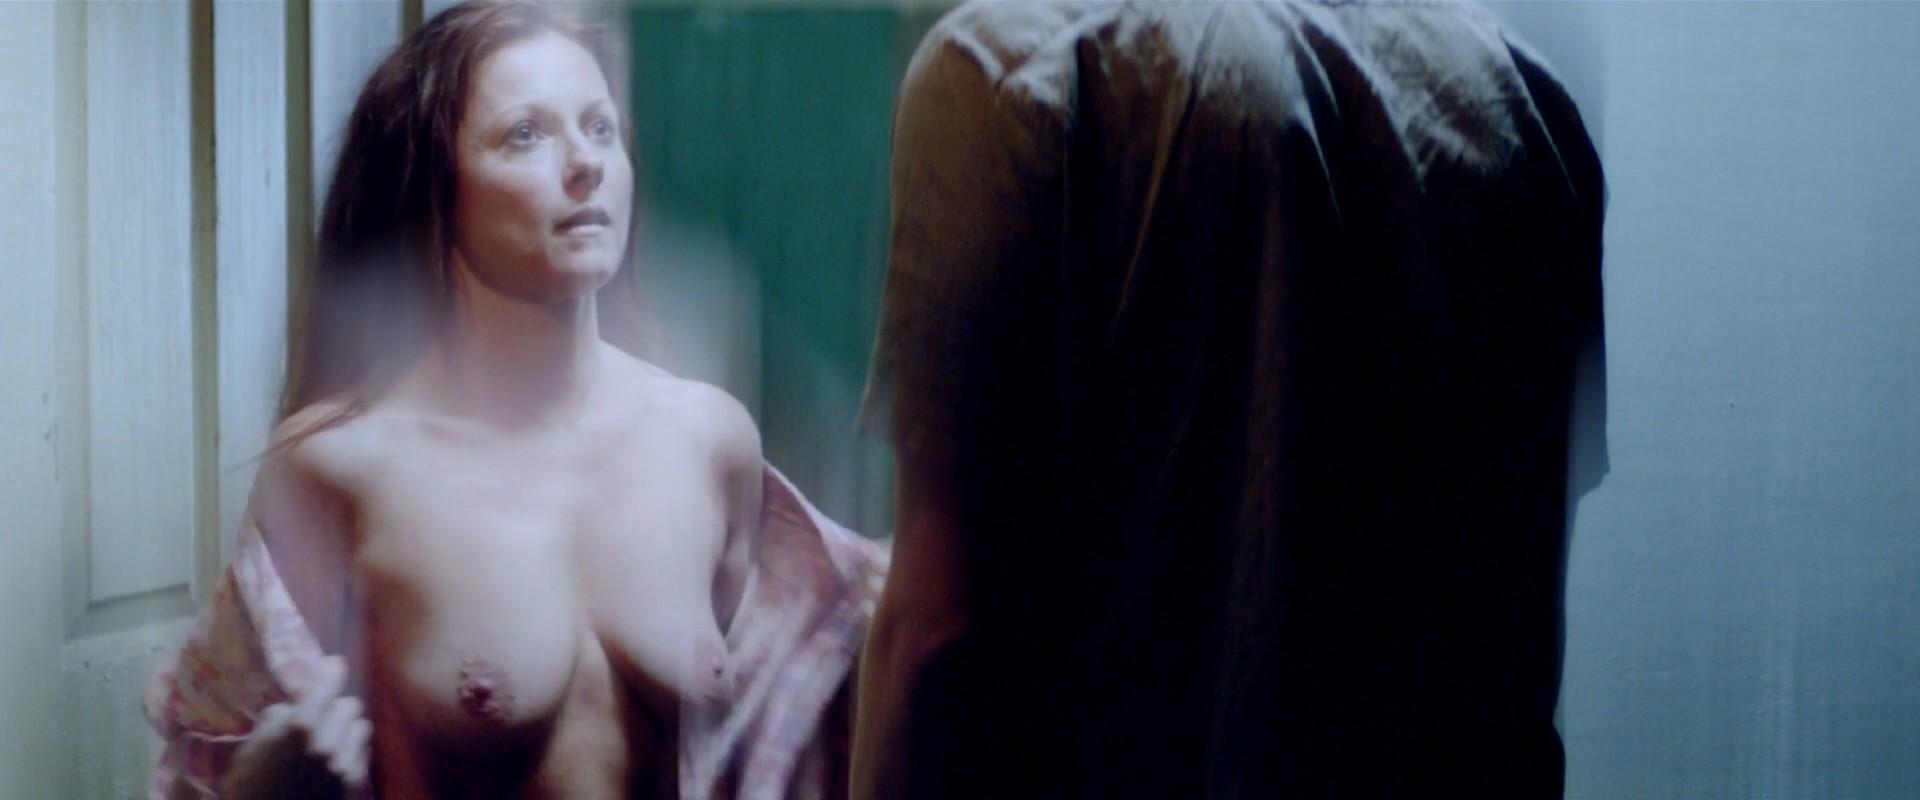 sharni vinson topless